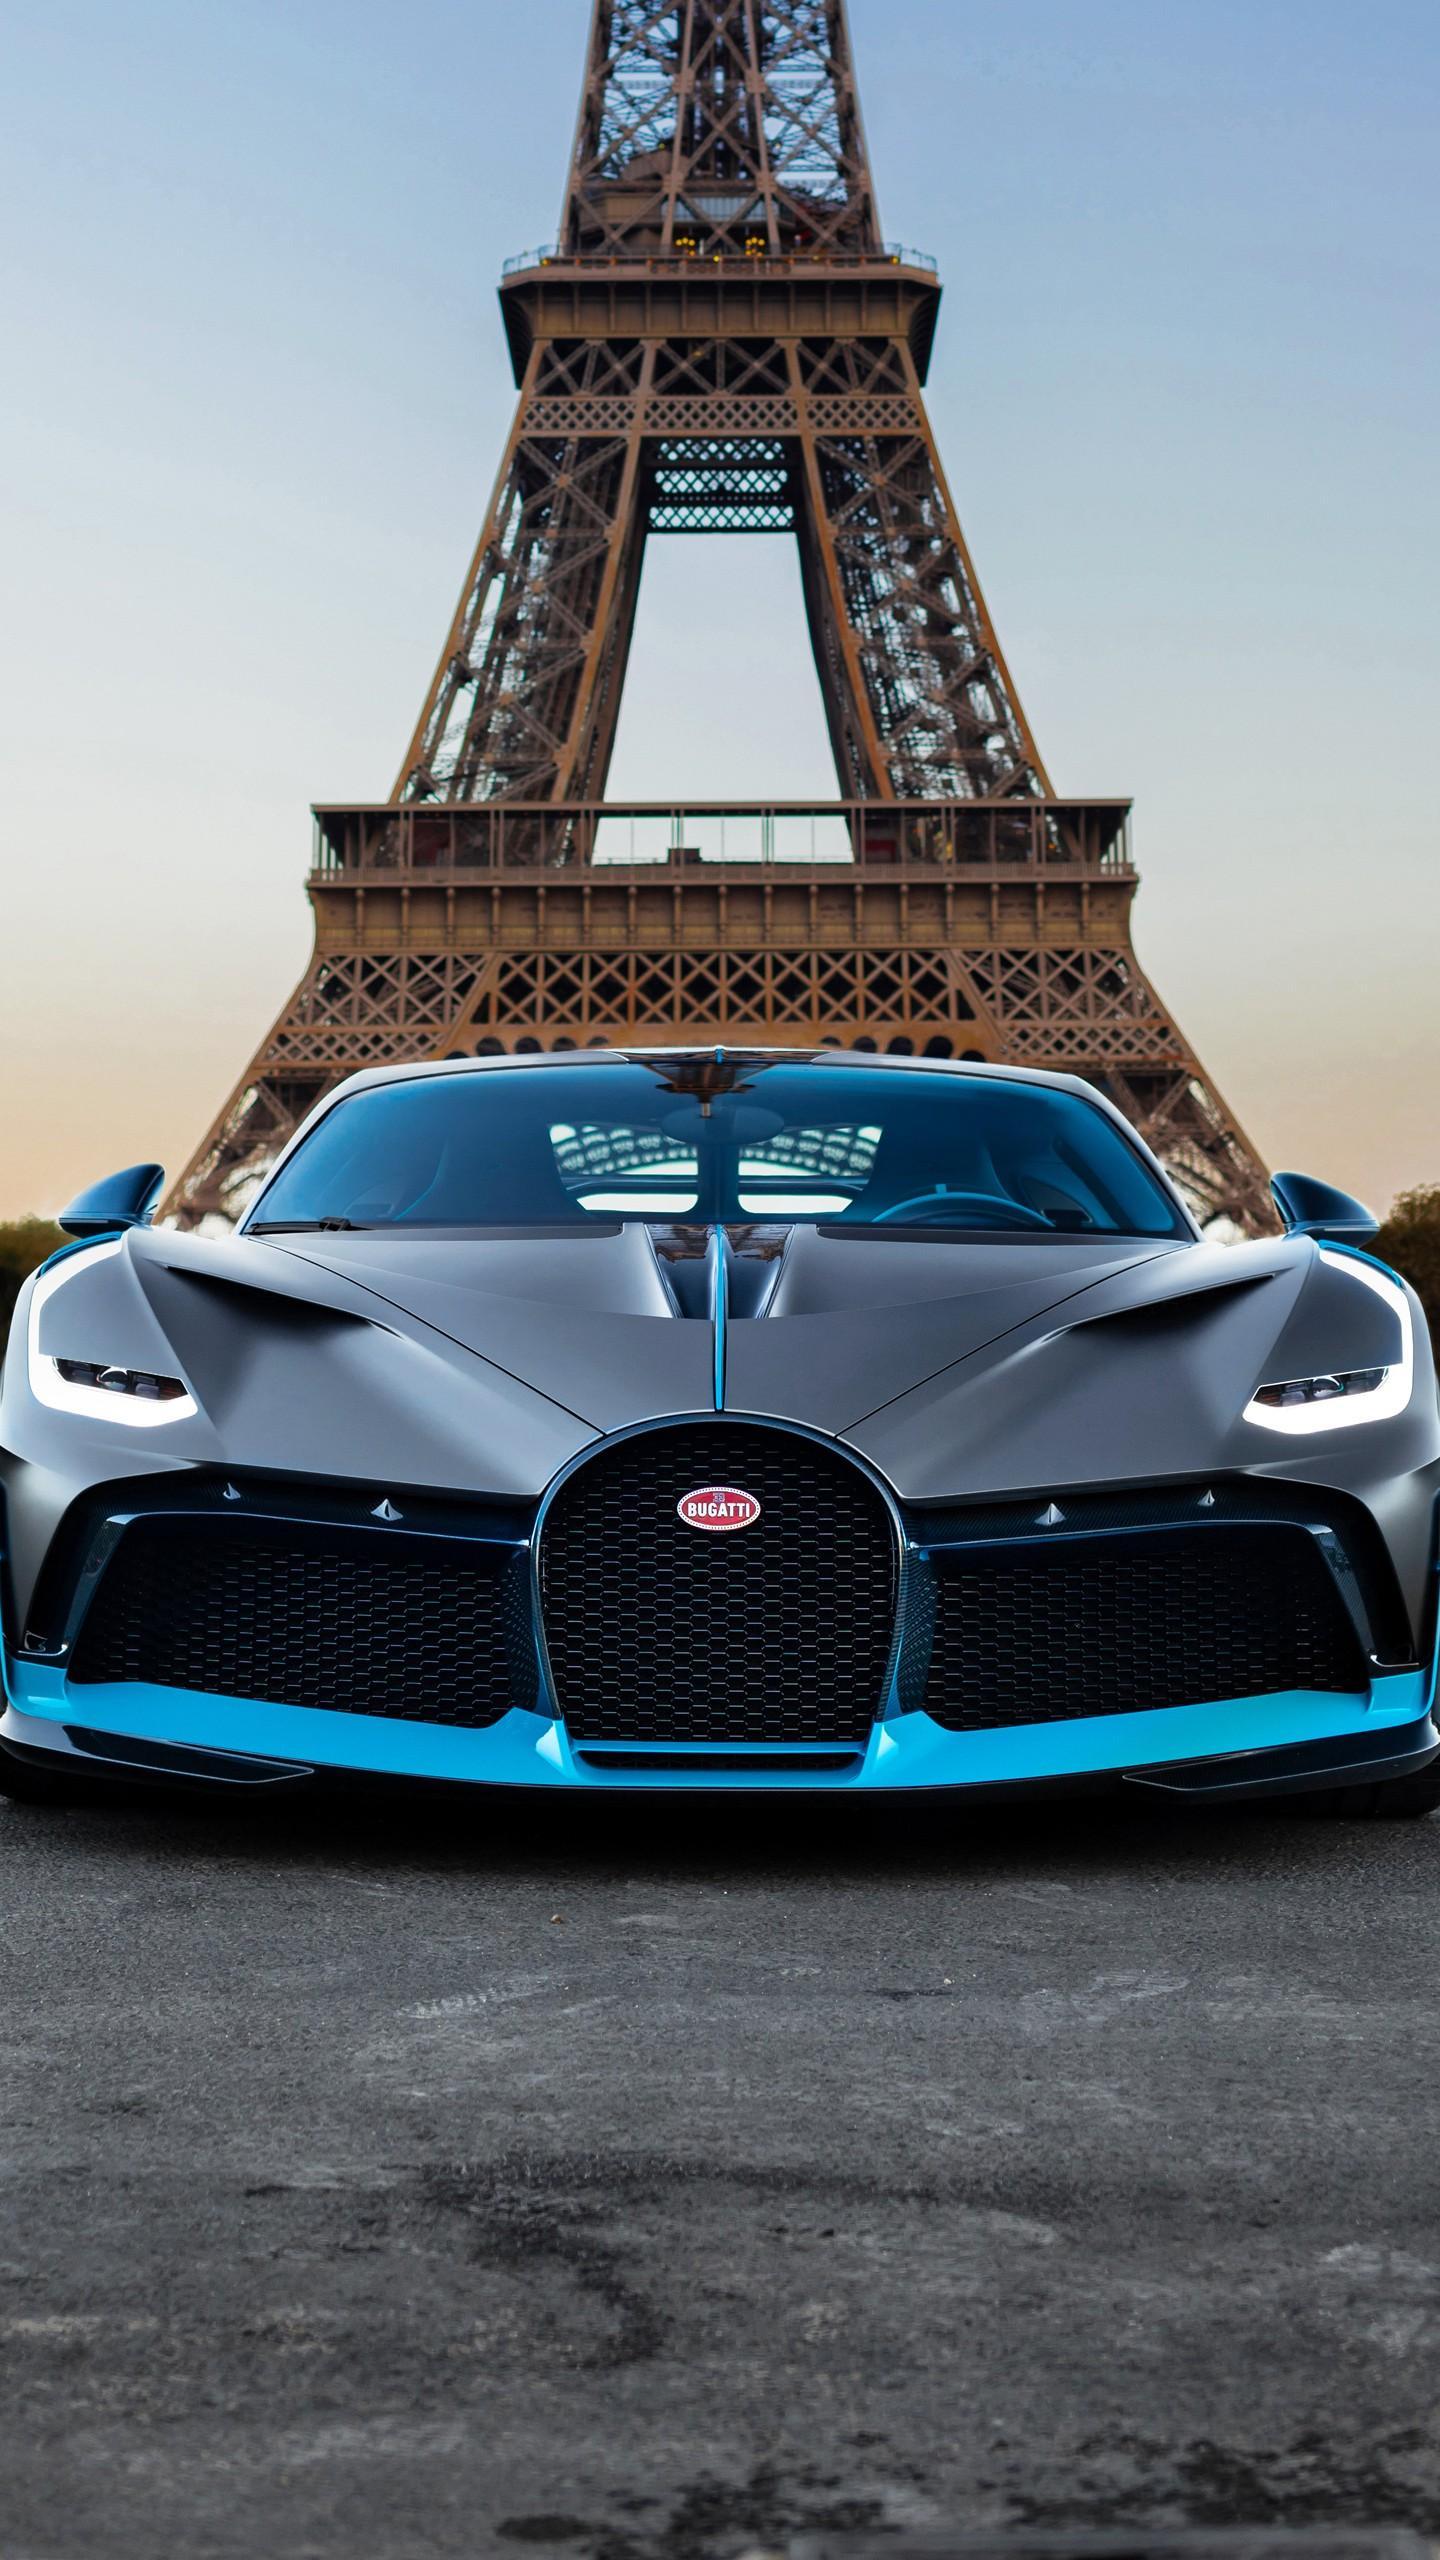 Bugatti Iphone Wallpapers Wallpaper Cave